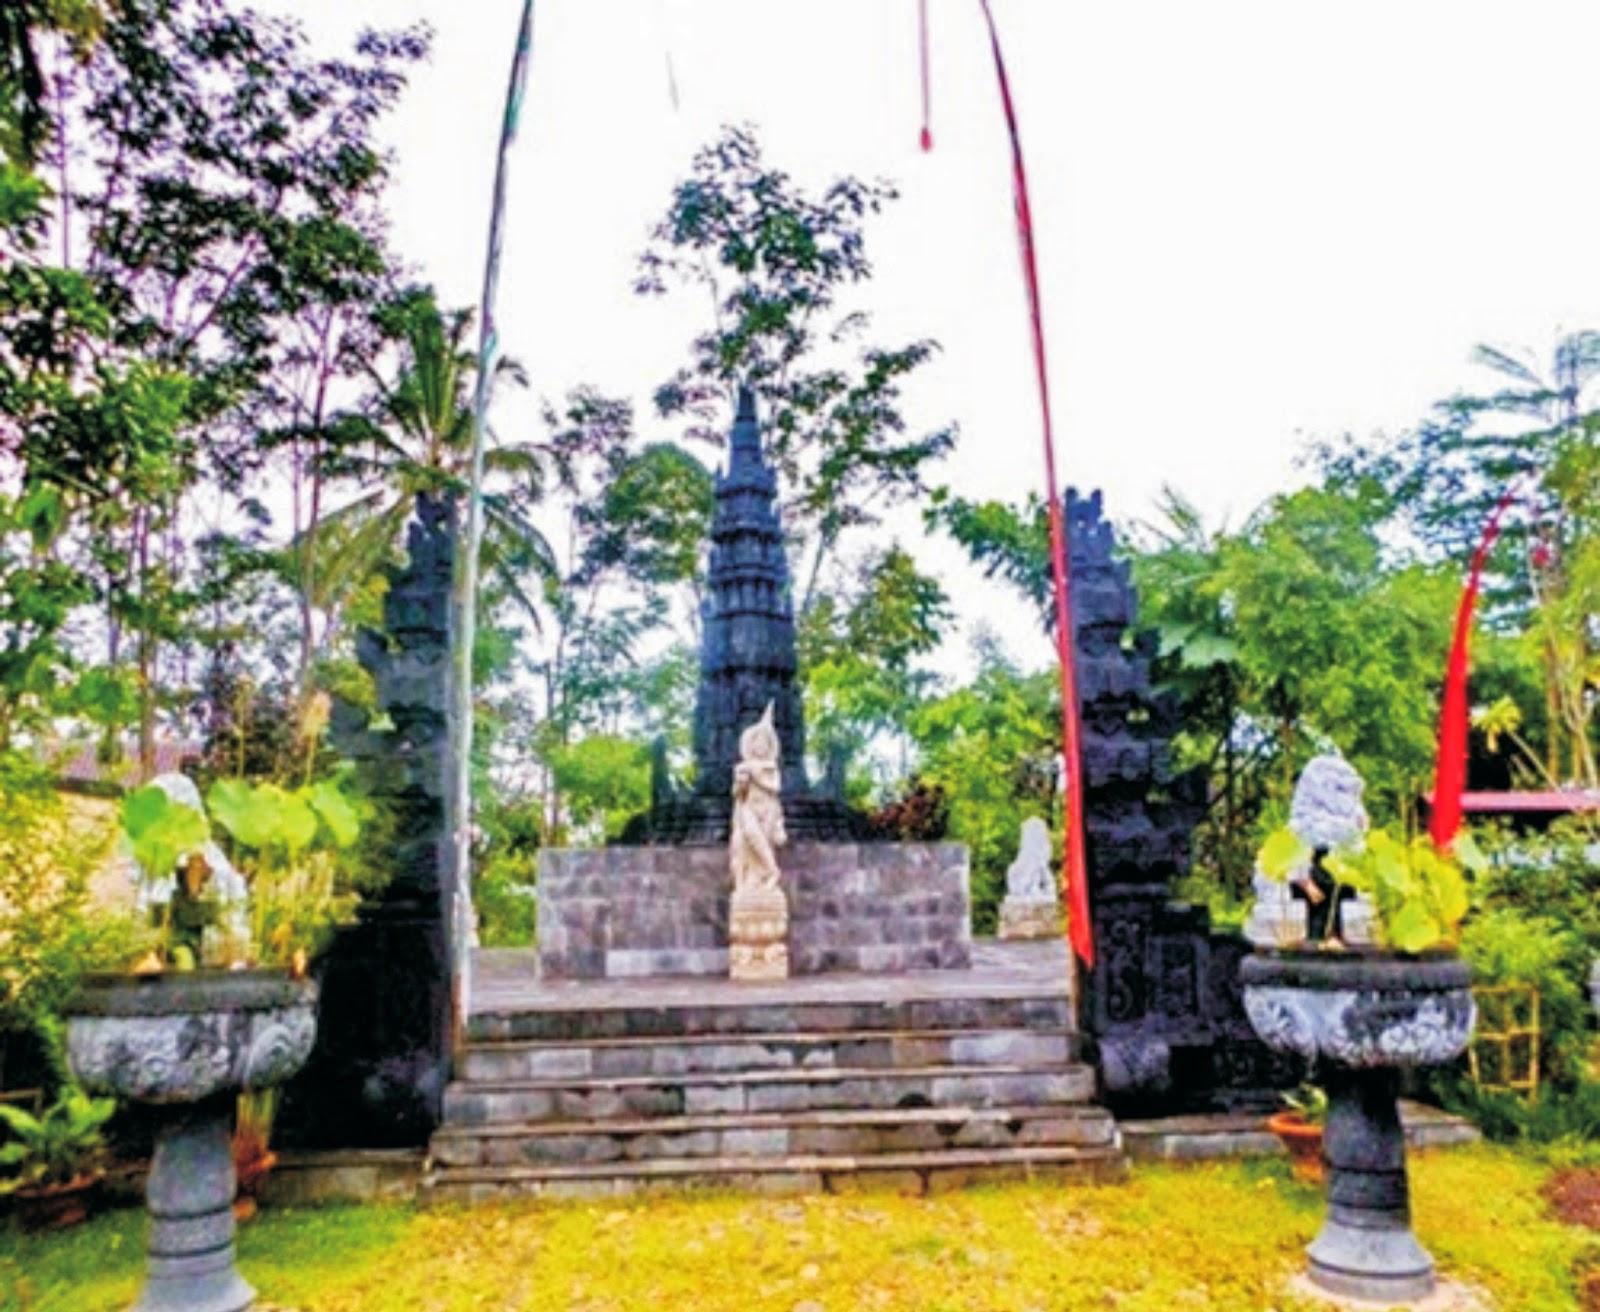 IInformasi Lengkap Kampung Bali Cibatu Garut - Fasilitas + Harga Tiket Masuk